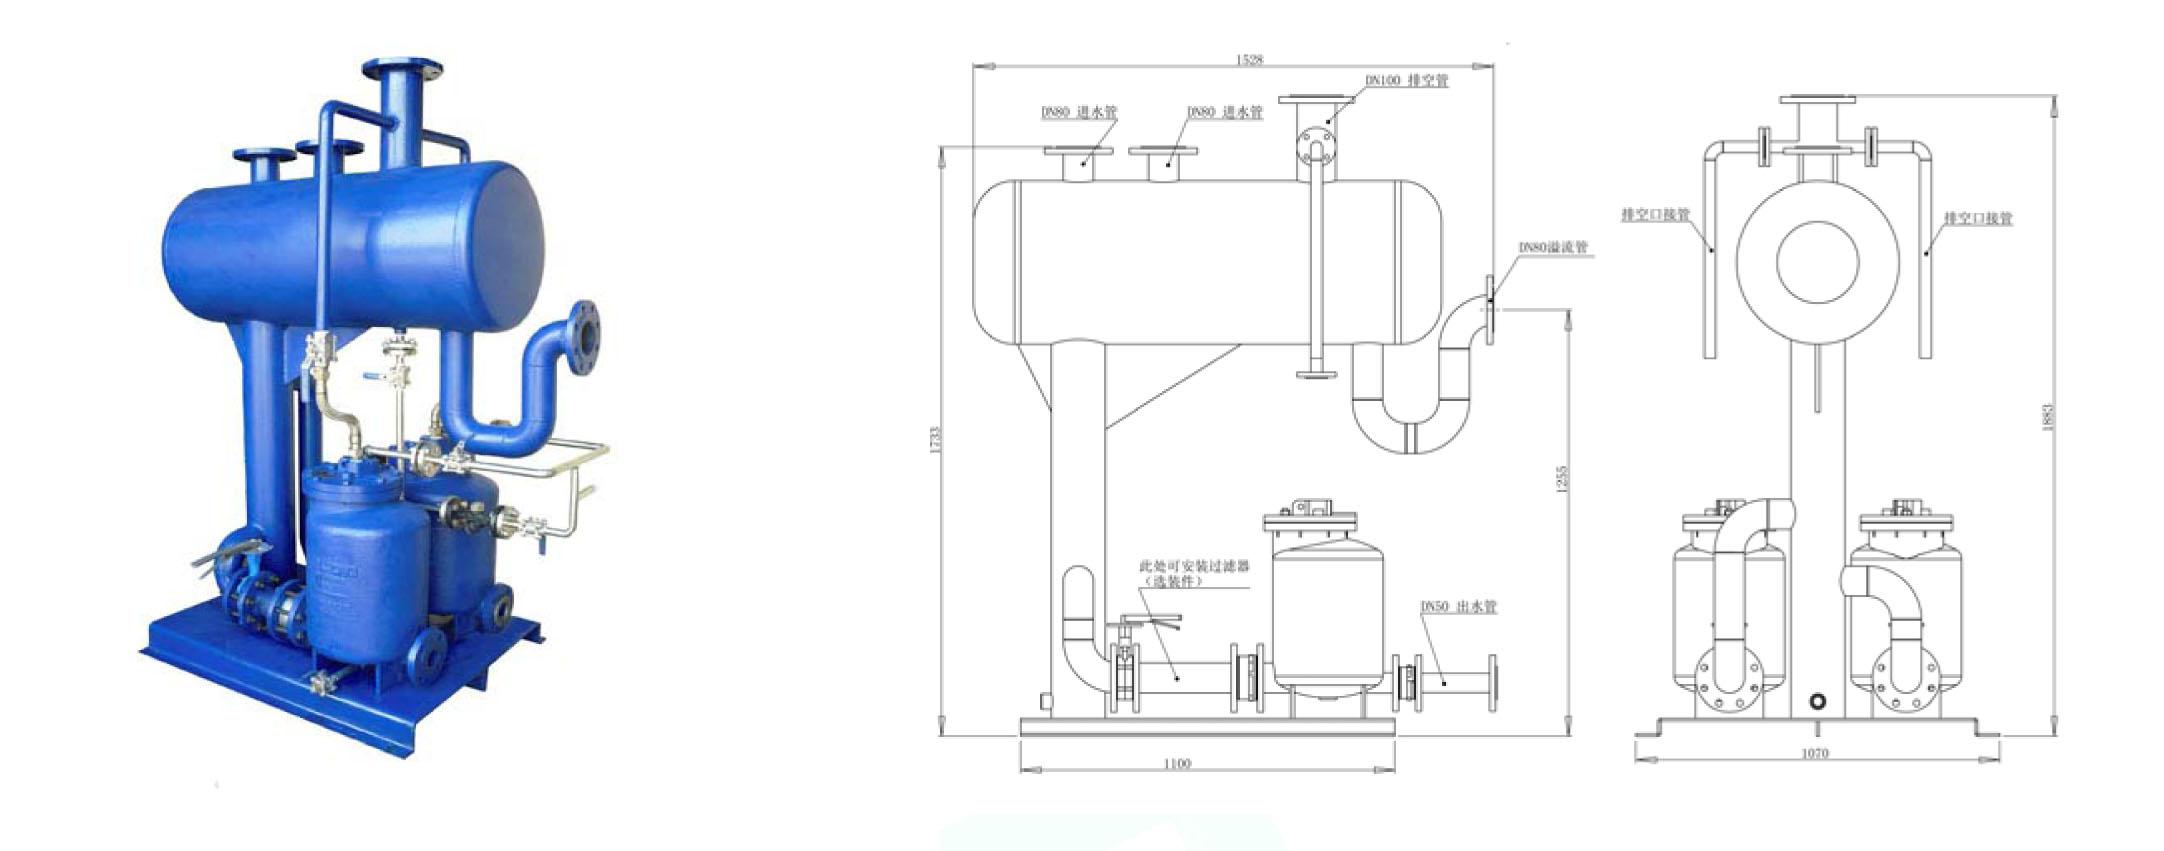 MFP14-2安裝尺寸圖(ali).jpg